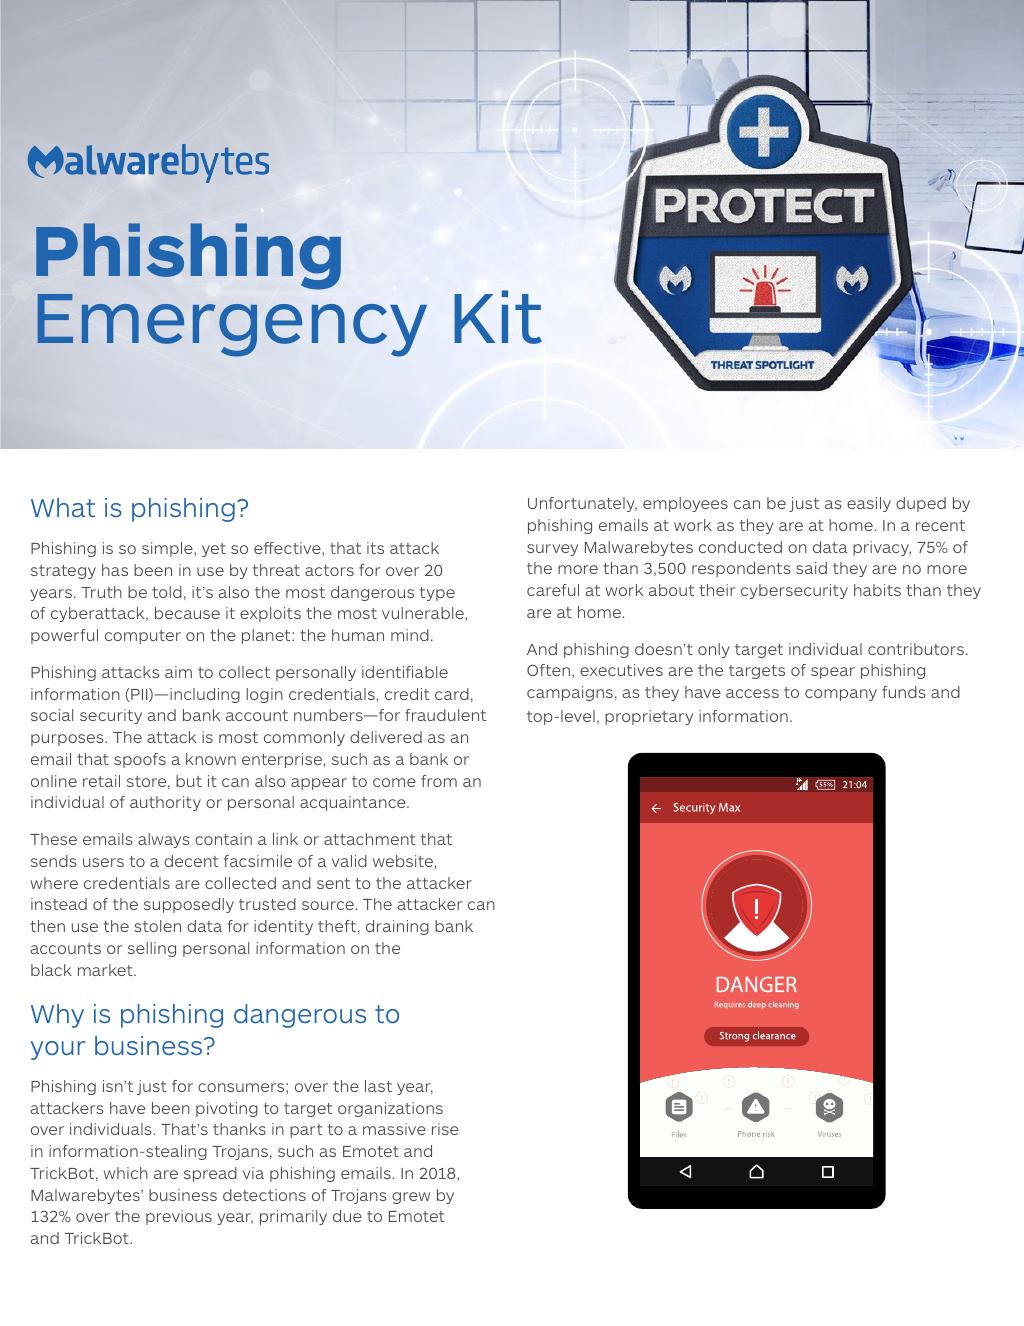 Malwarebytes Emergency Kit Phishing